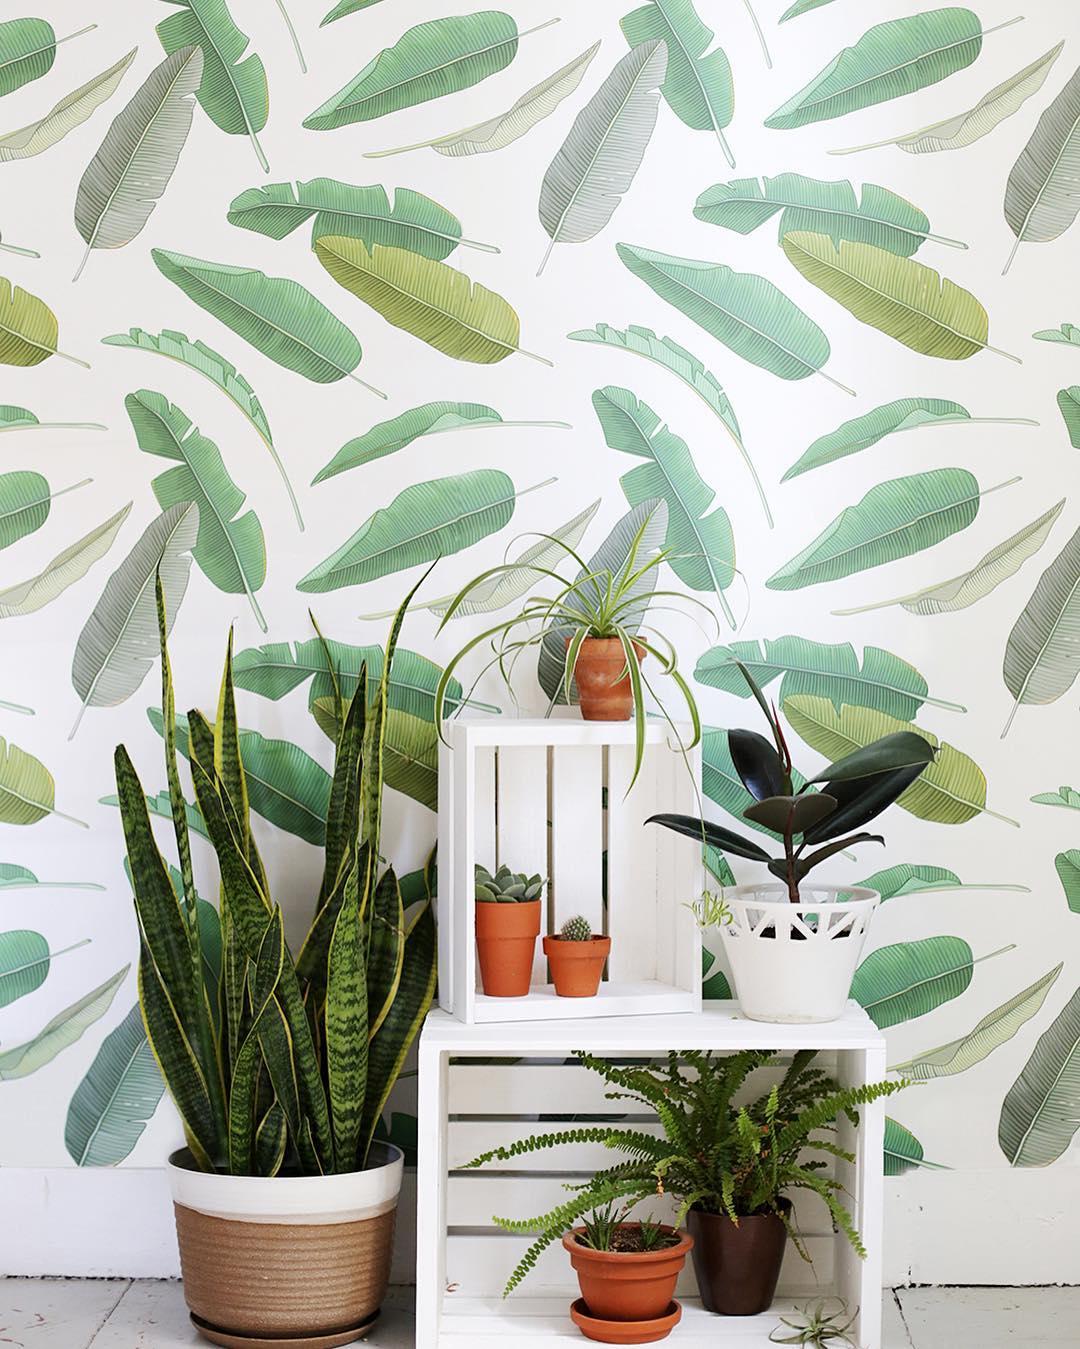 Banana Leaf Wallpaper. Bold. Beautiful. A No Brainer! Only at WallsNeedLove